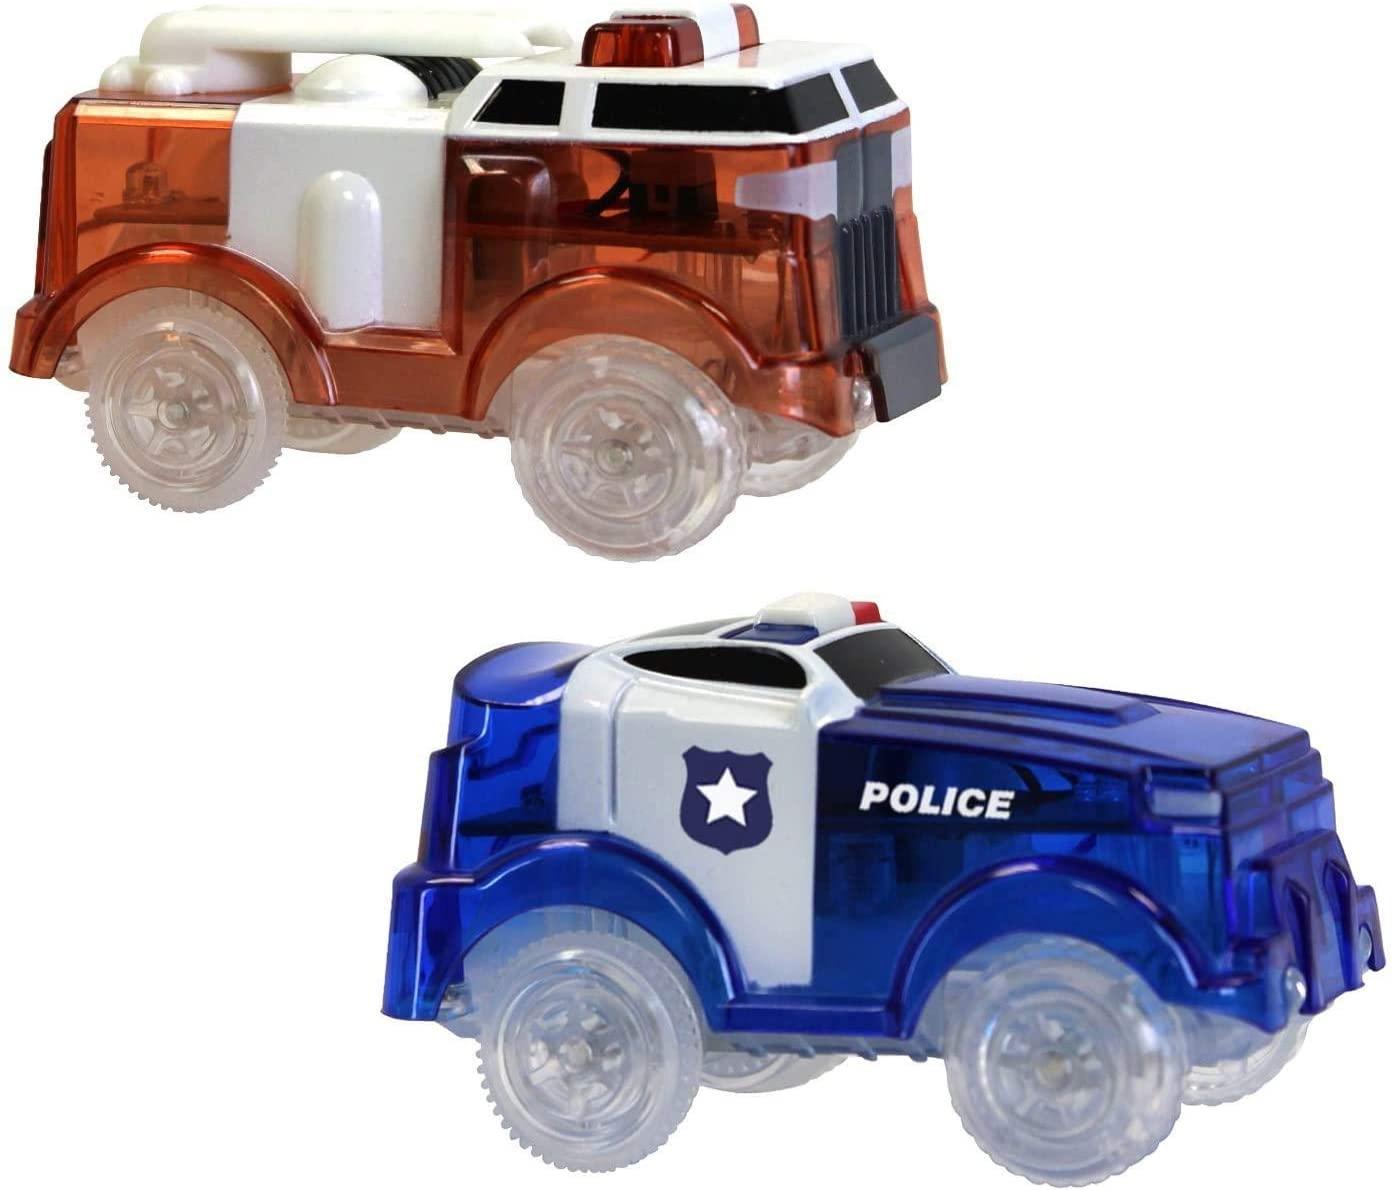 Ontel Magic Tracks - Fire Truck & Police Car